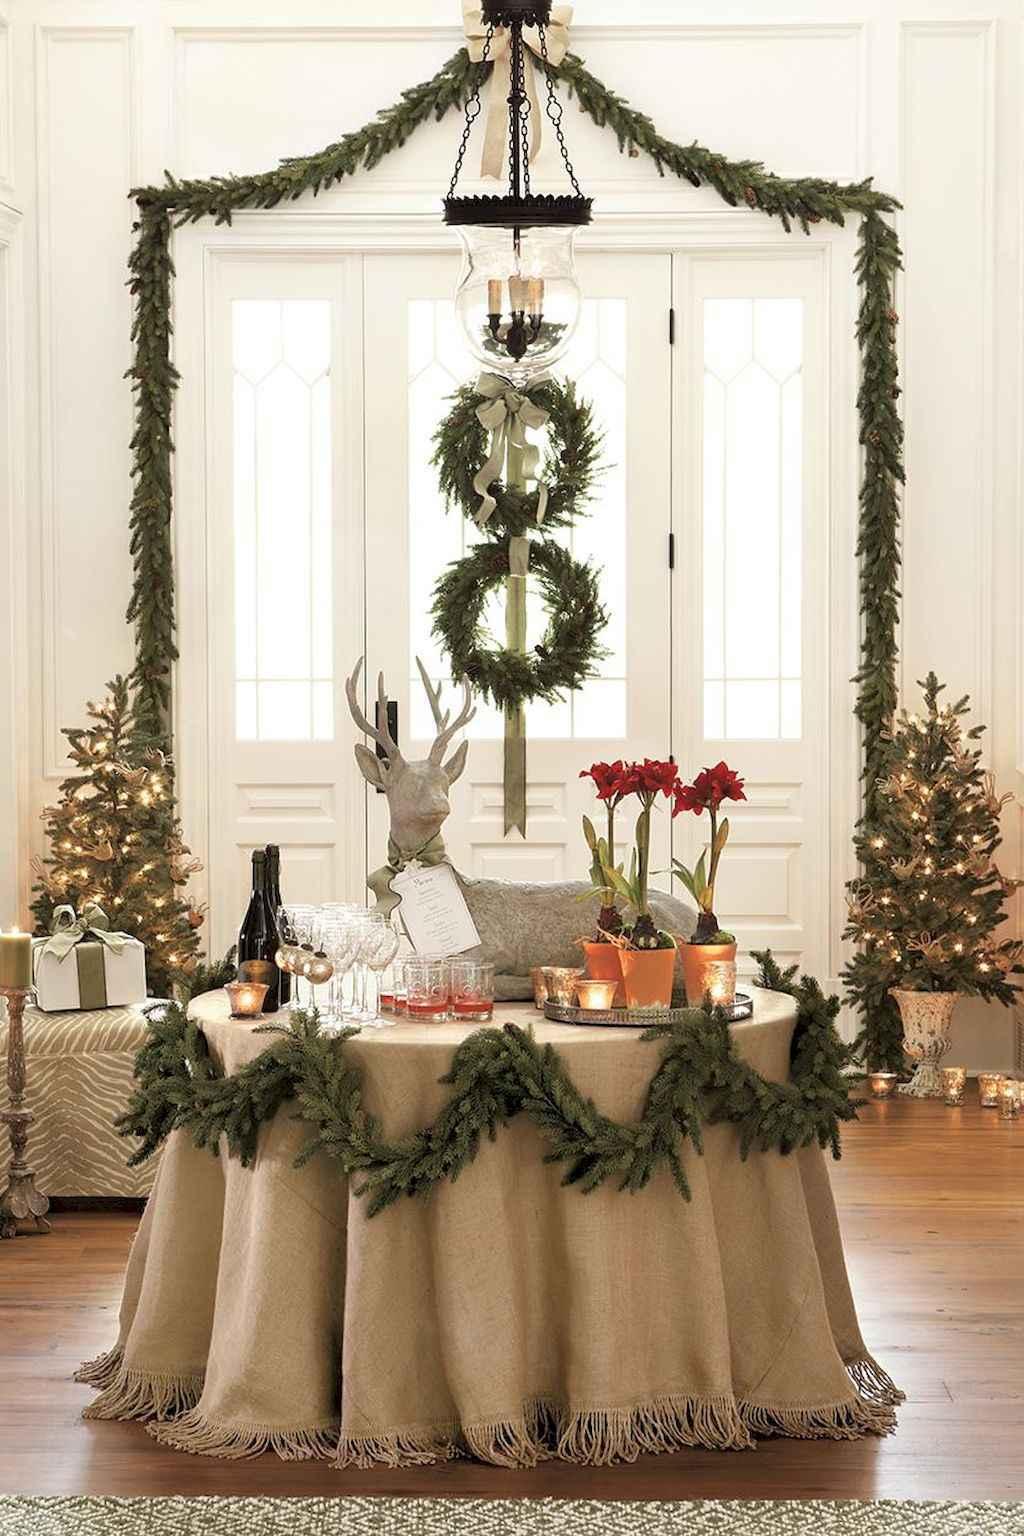 25 Elegant Christmas Party Table Decorations Ideas 11